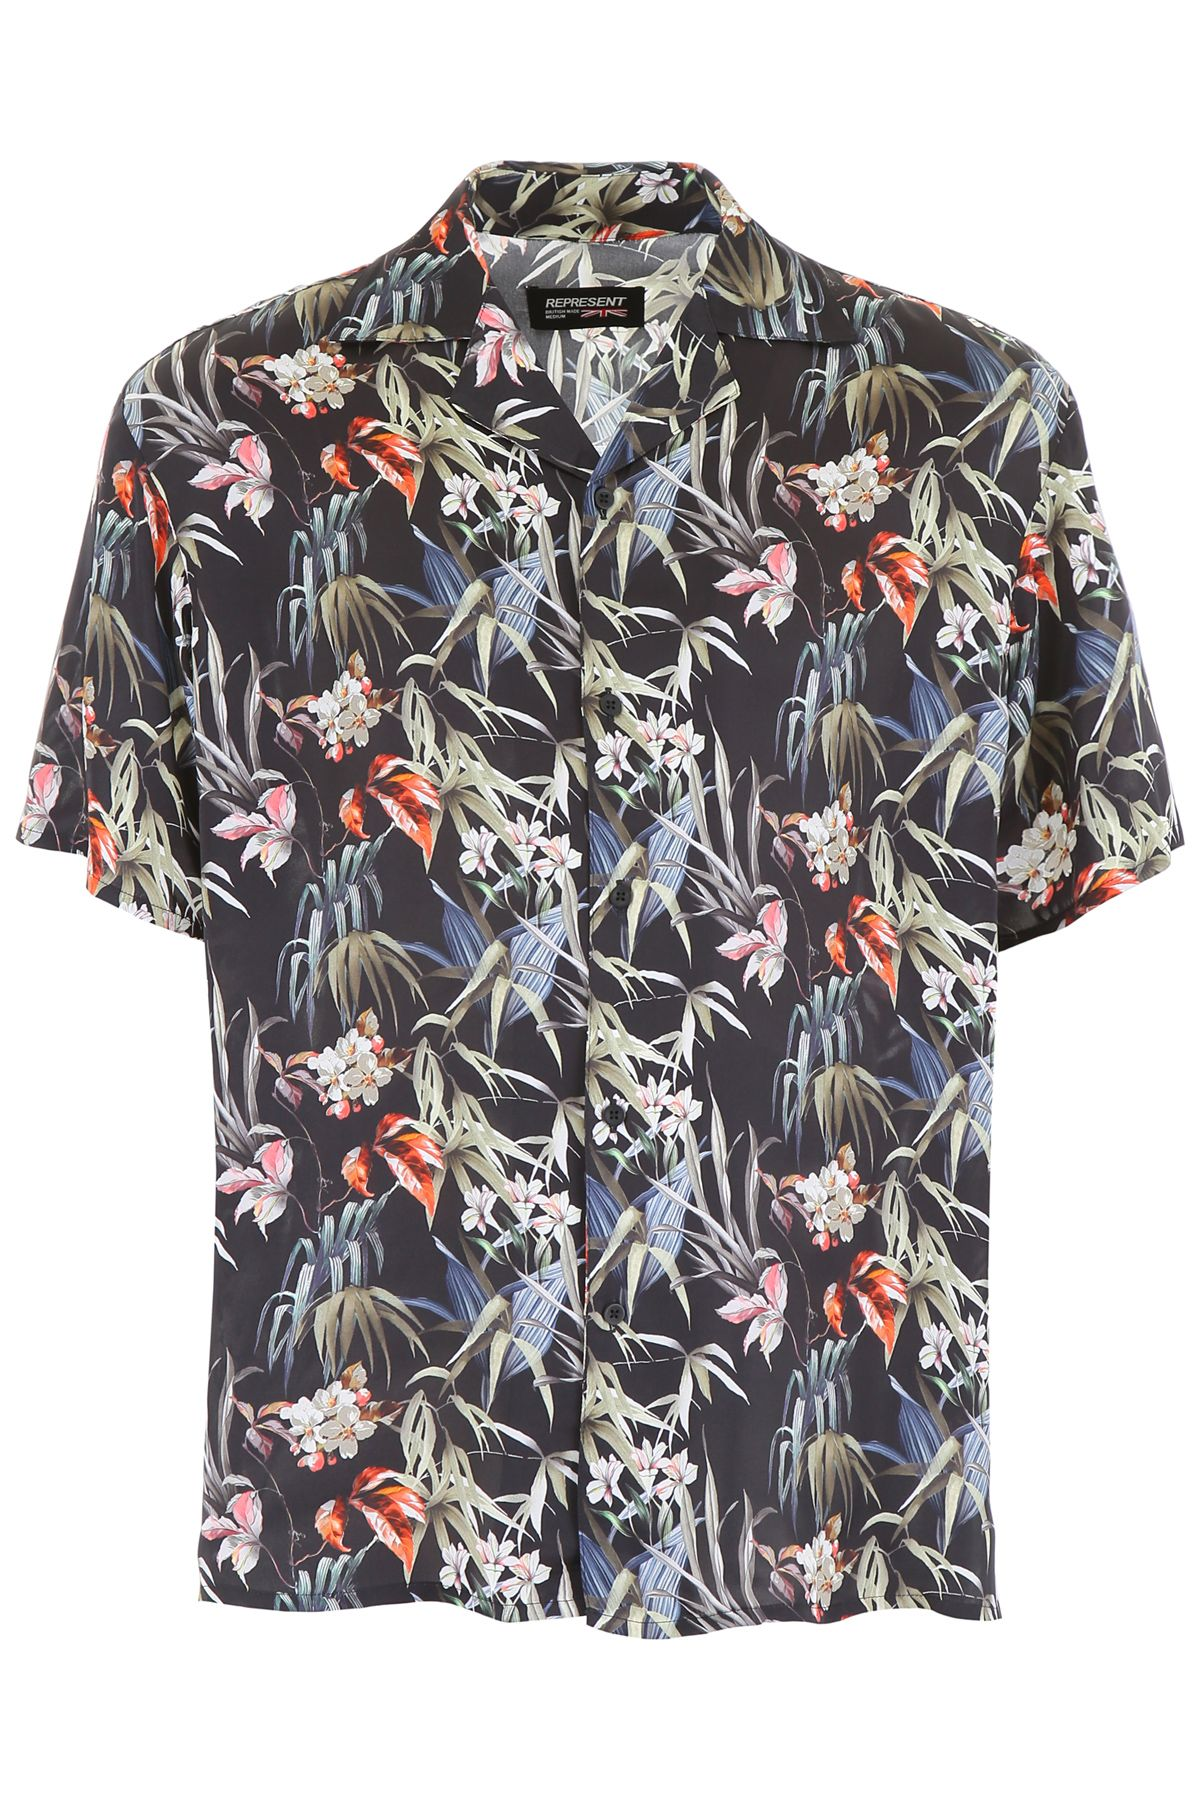 Represent T-shirts PRINTED SHIRT